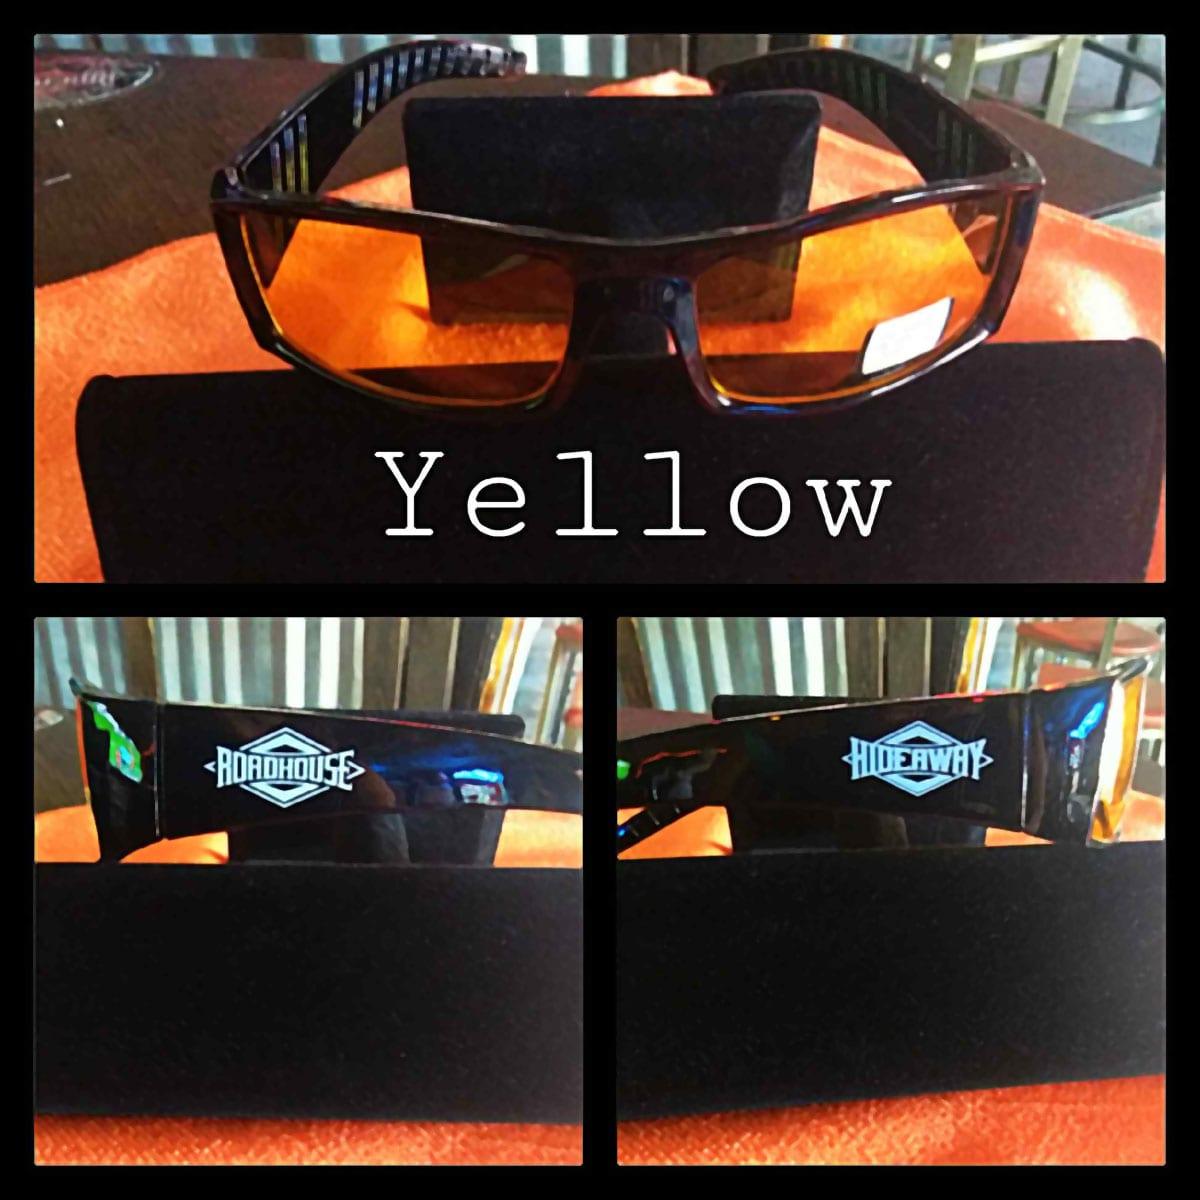 Roadhouse / Hideaway Glasses - Yellow Tinted Lenses